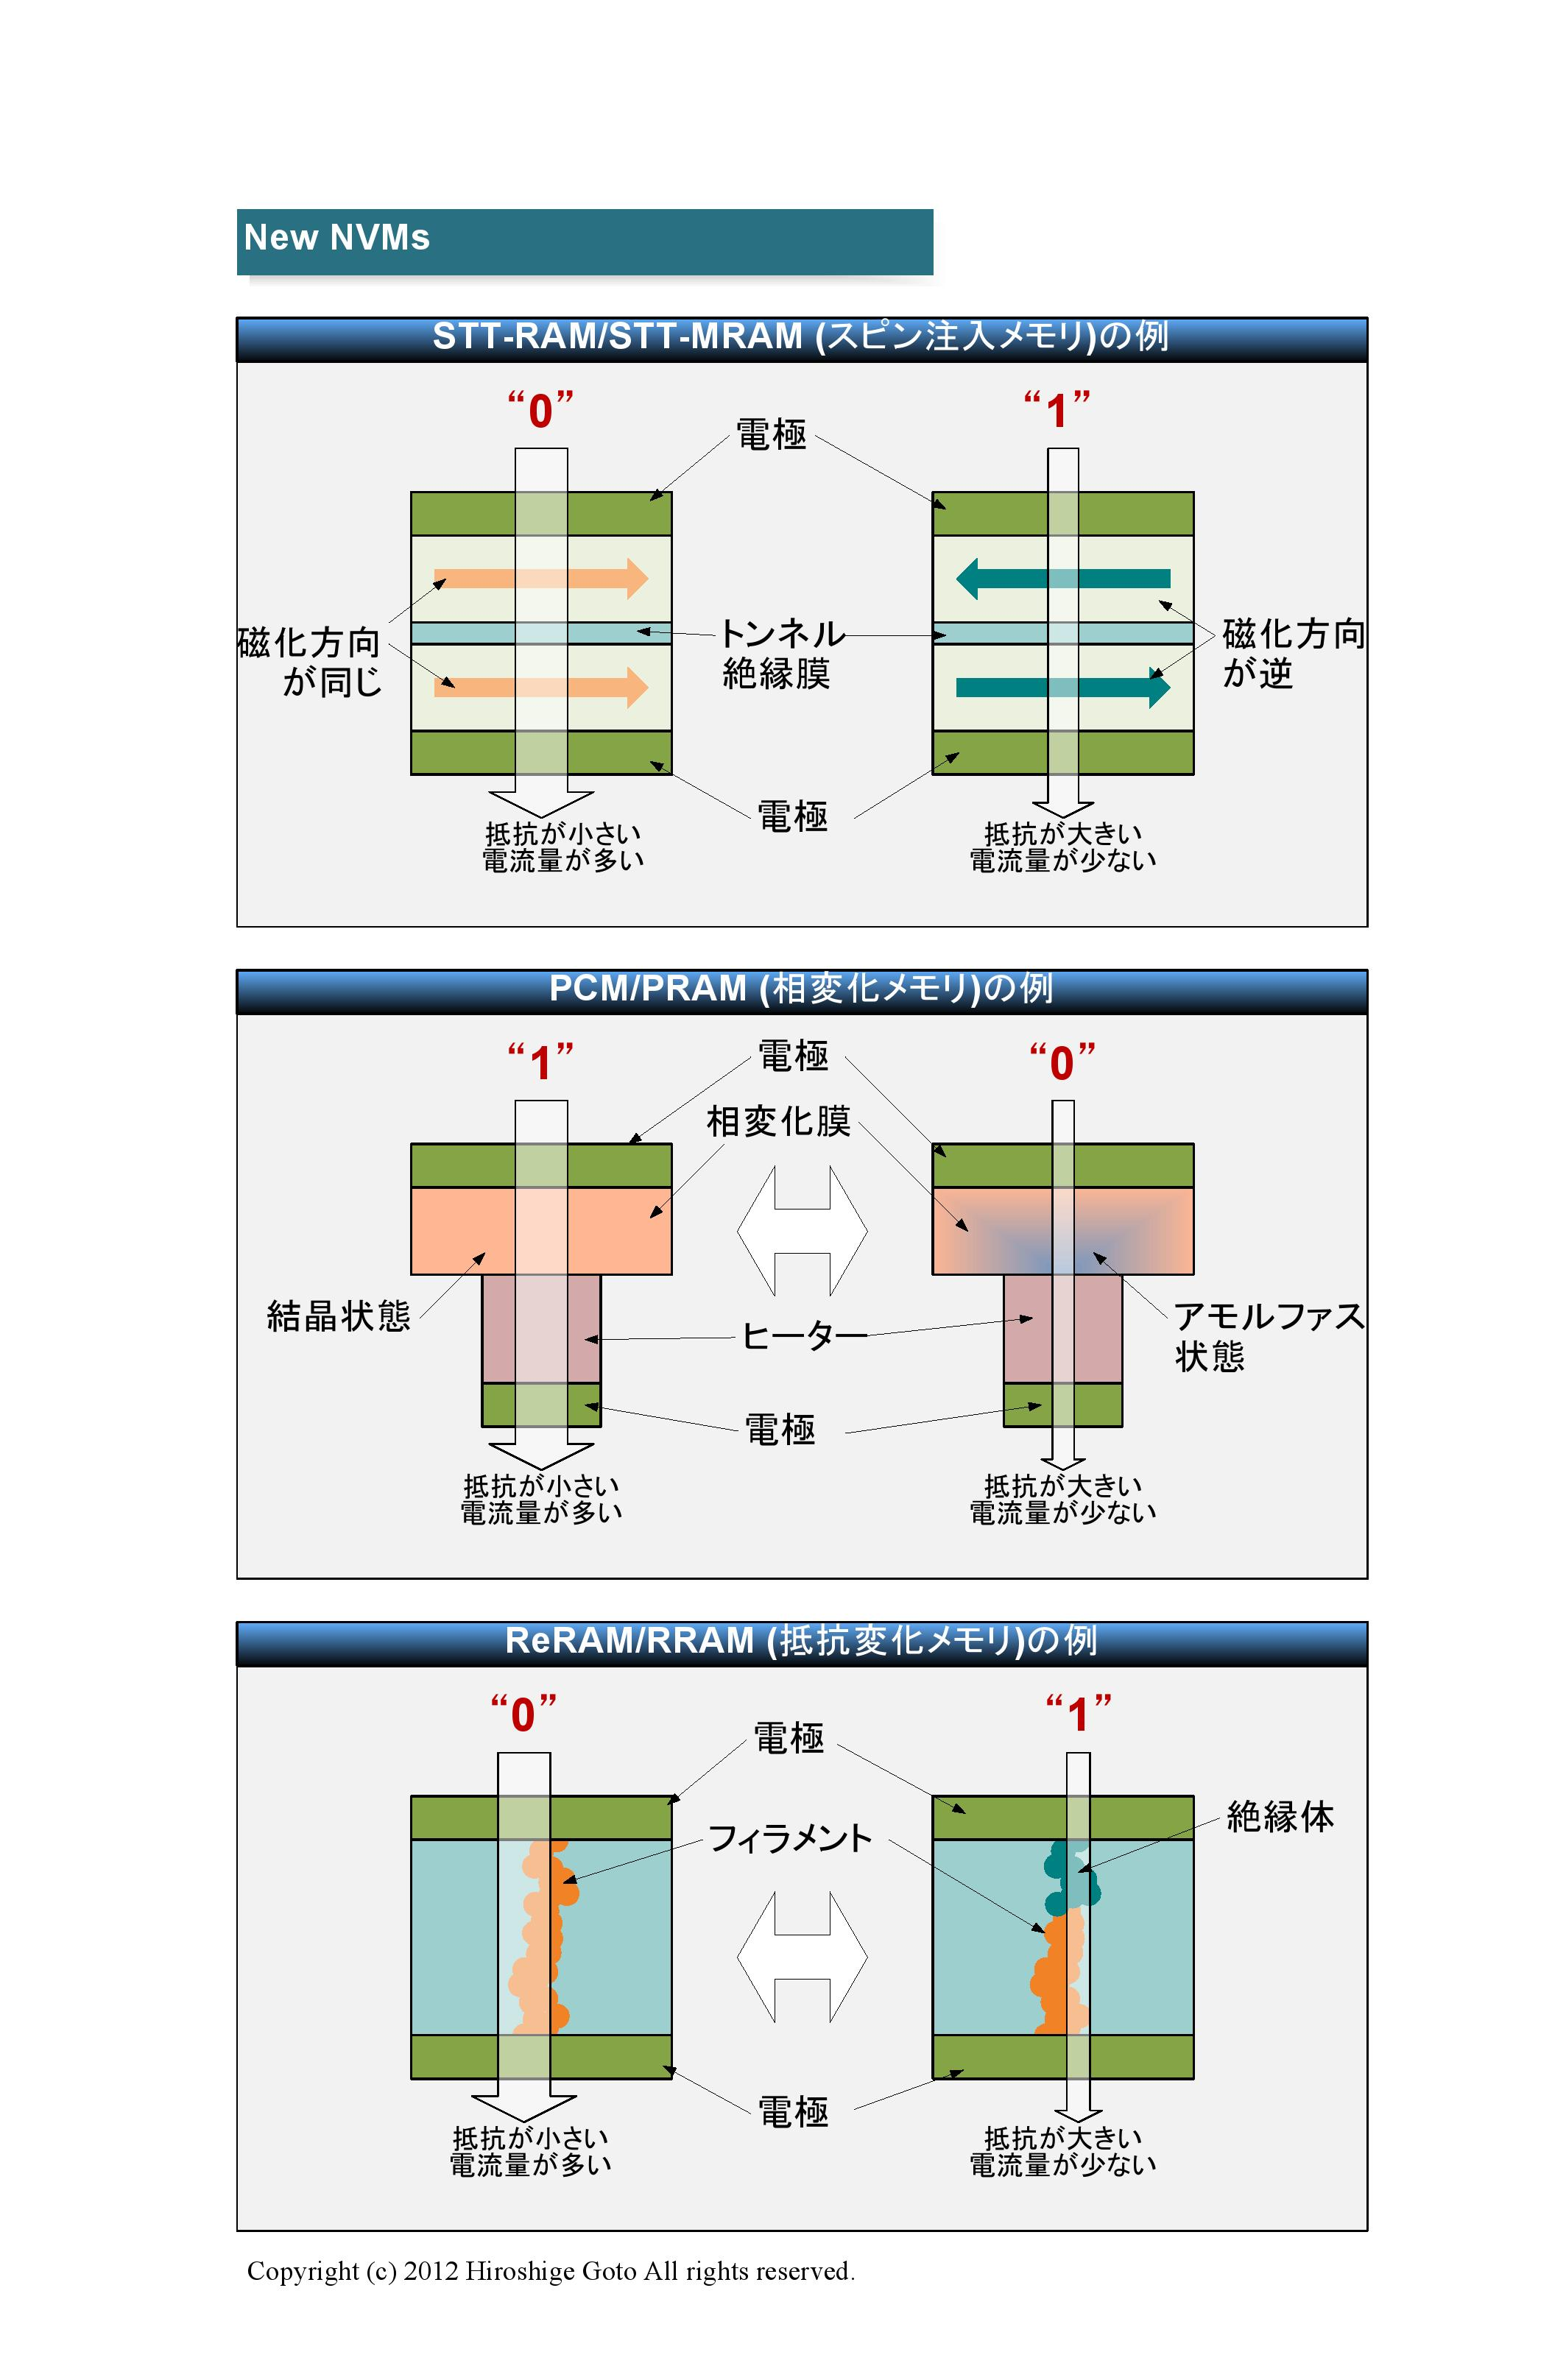 "NVM技術<br class="""">PDF版は<span class=""img-inline raw""><a href=""/video/pcw/docs/580/768/p6.pdf"" ipw_status=""1"" ipw_linktype=""filelink_raw"" class=""resource"">こちら</a></span>"